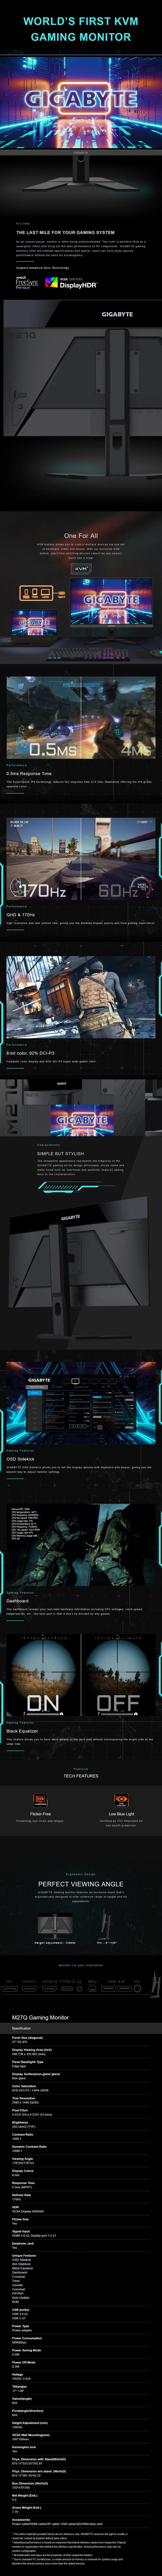 gigabyte_m27q_27_170hz_qhd_1ms_freesync_ips_gaming_monitor_with_kvm_ac38746_13.jpg